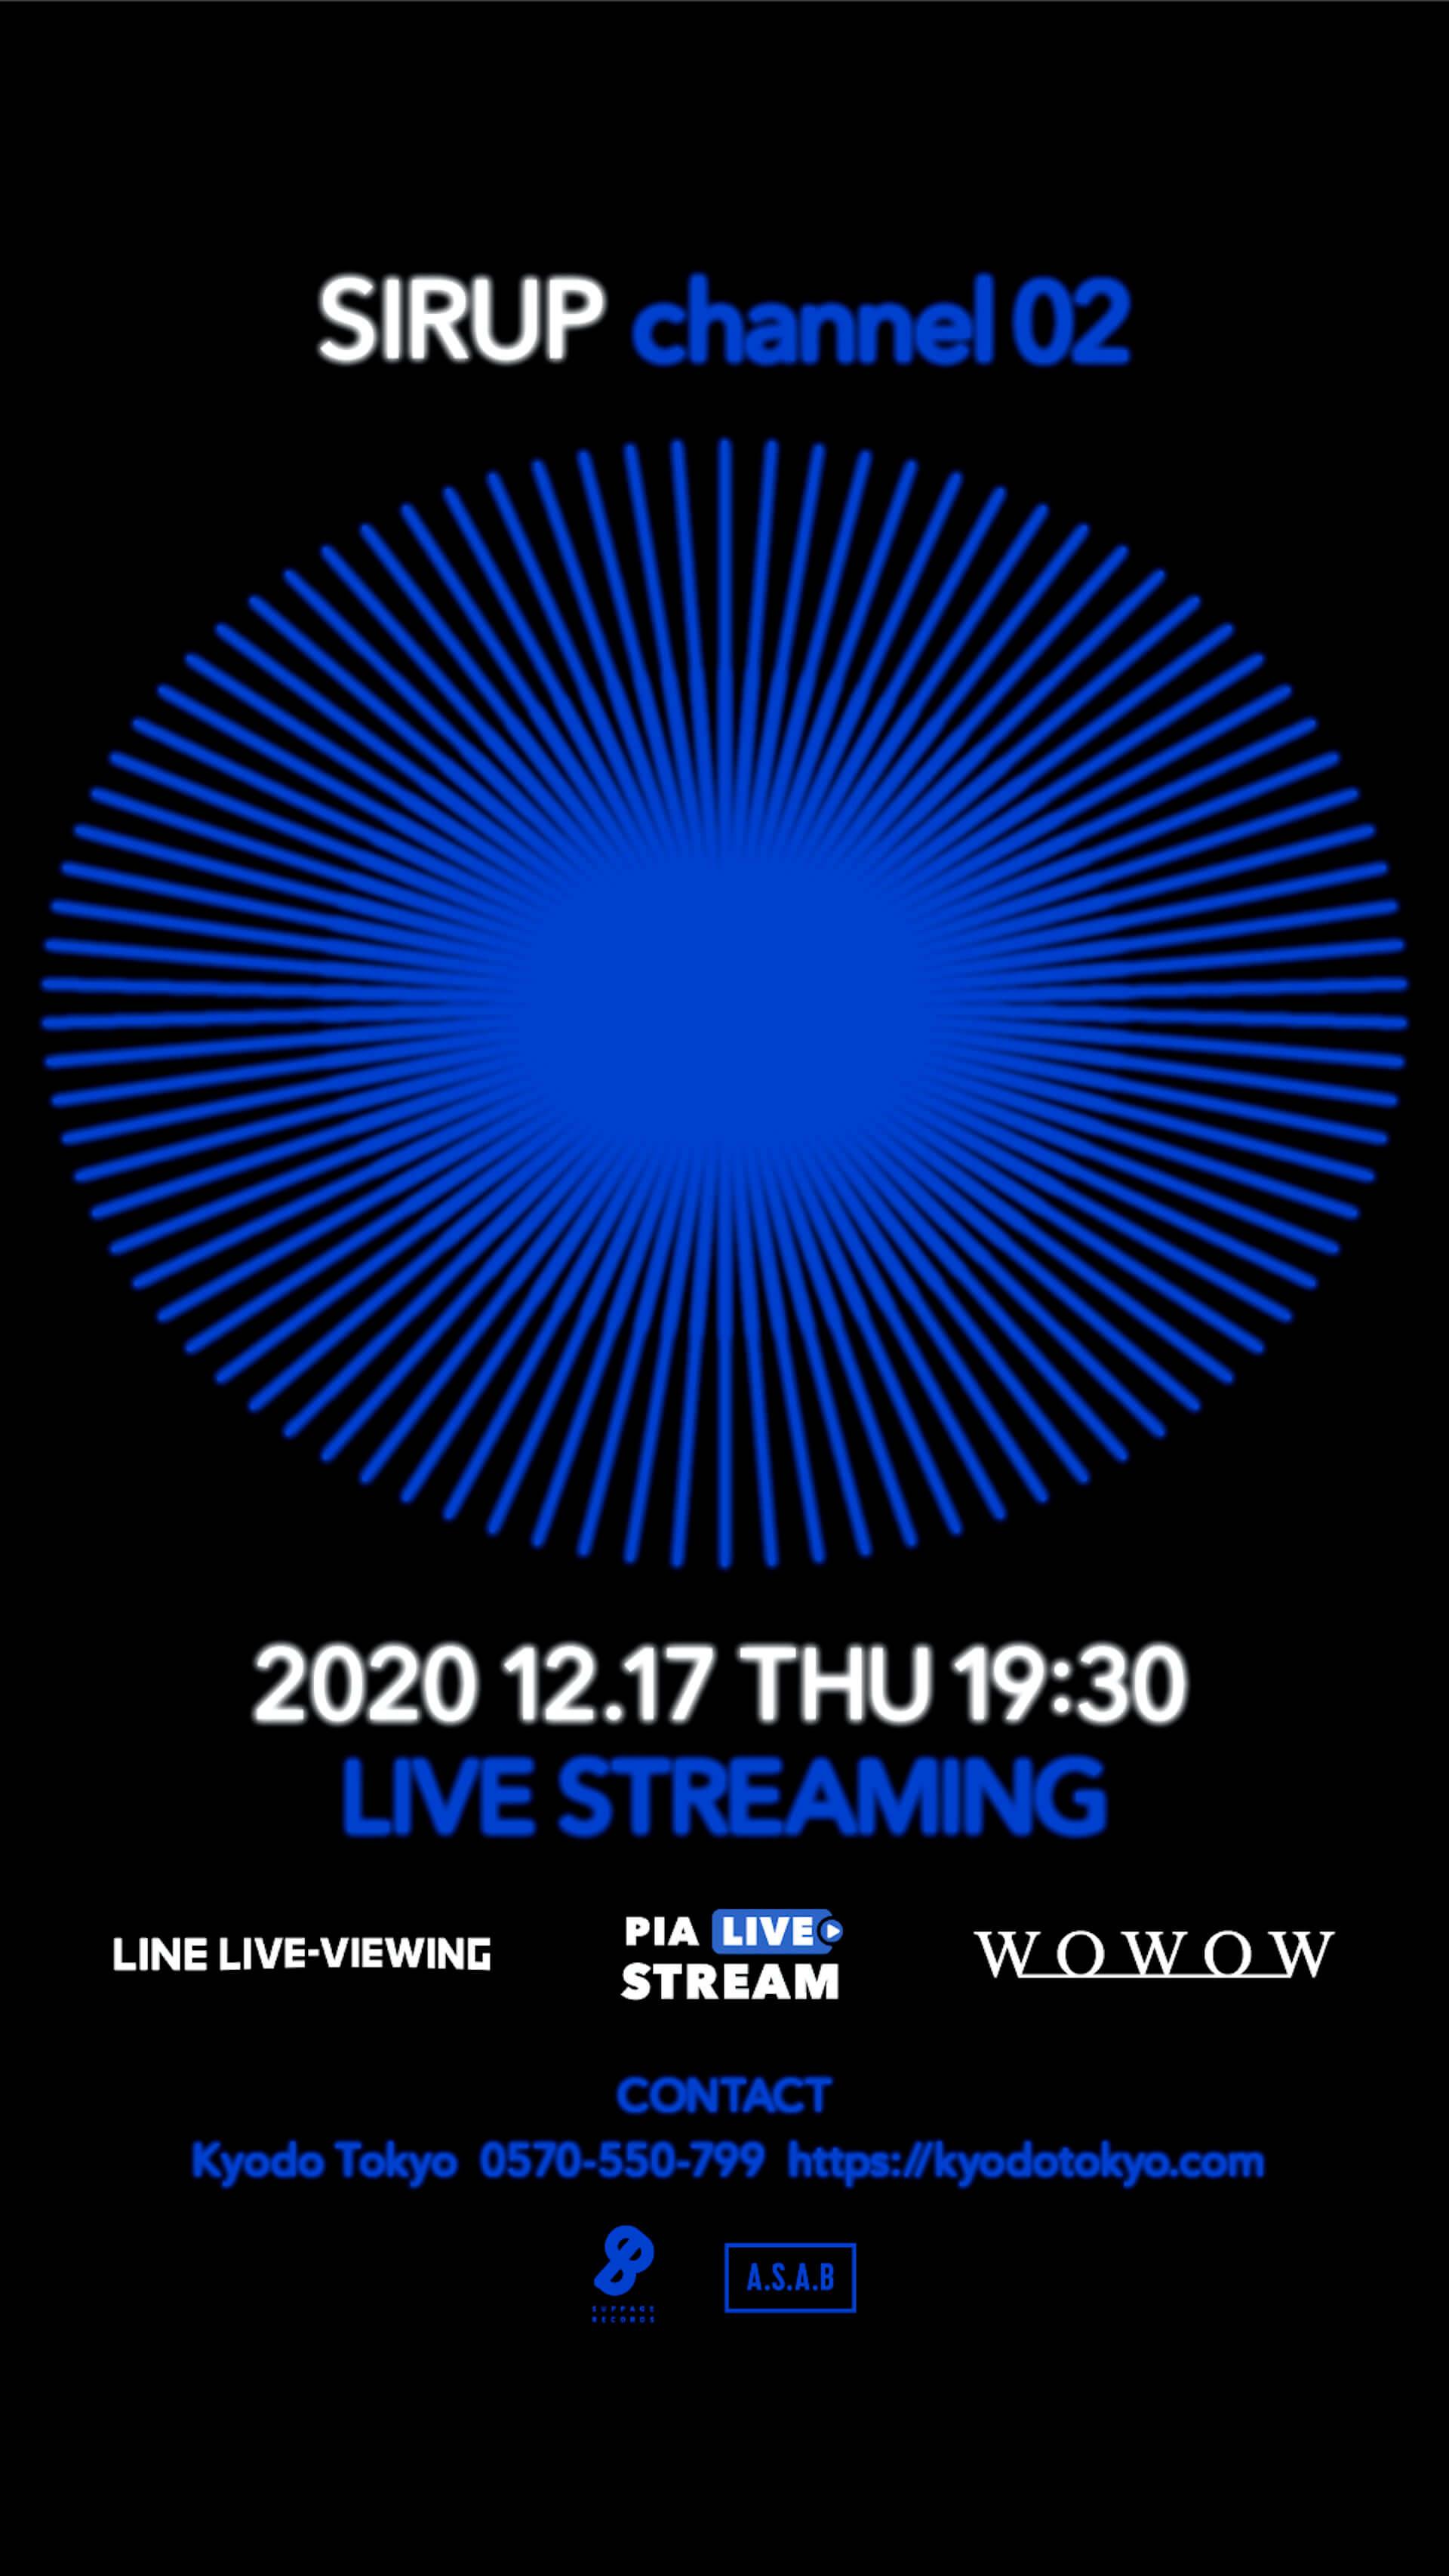 SIRUPの無観客ライブ<channel 02>がKT Zepp Yokohamaより配信決定!WOWOWでの生中継も実施 music201002_sirup_1-1920x3413